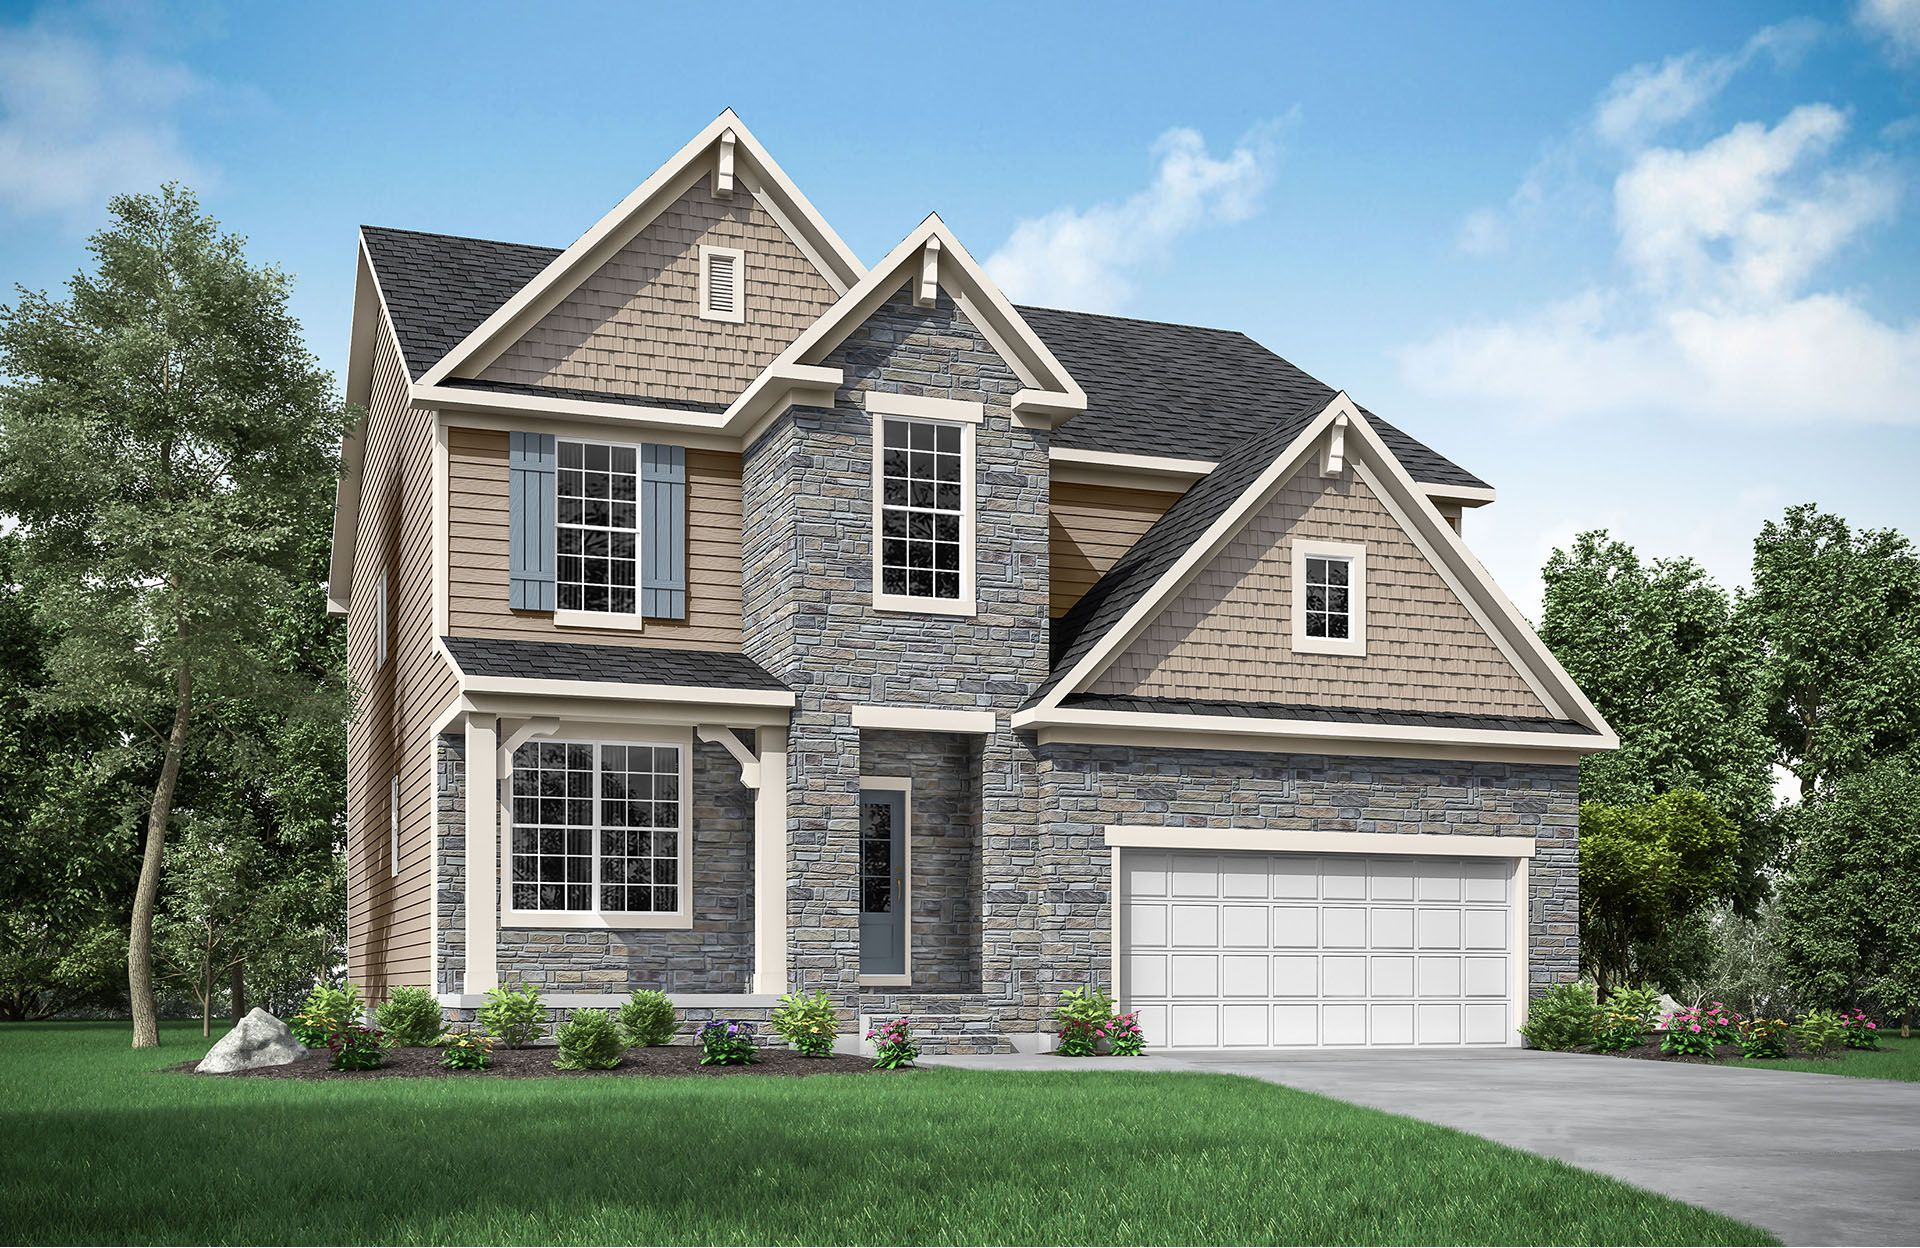 Single Family for Active at Northwood 508 Adkins Ridge Road Rolesville, North Carolina 27571 United States